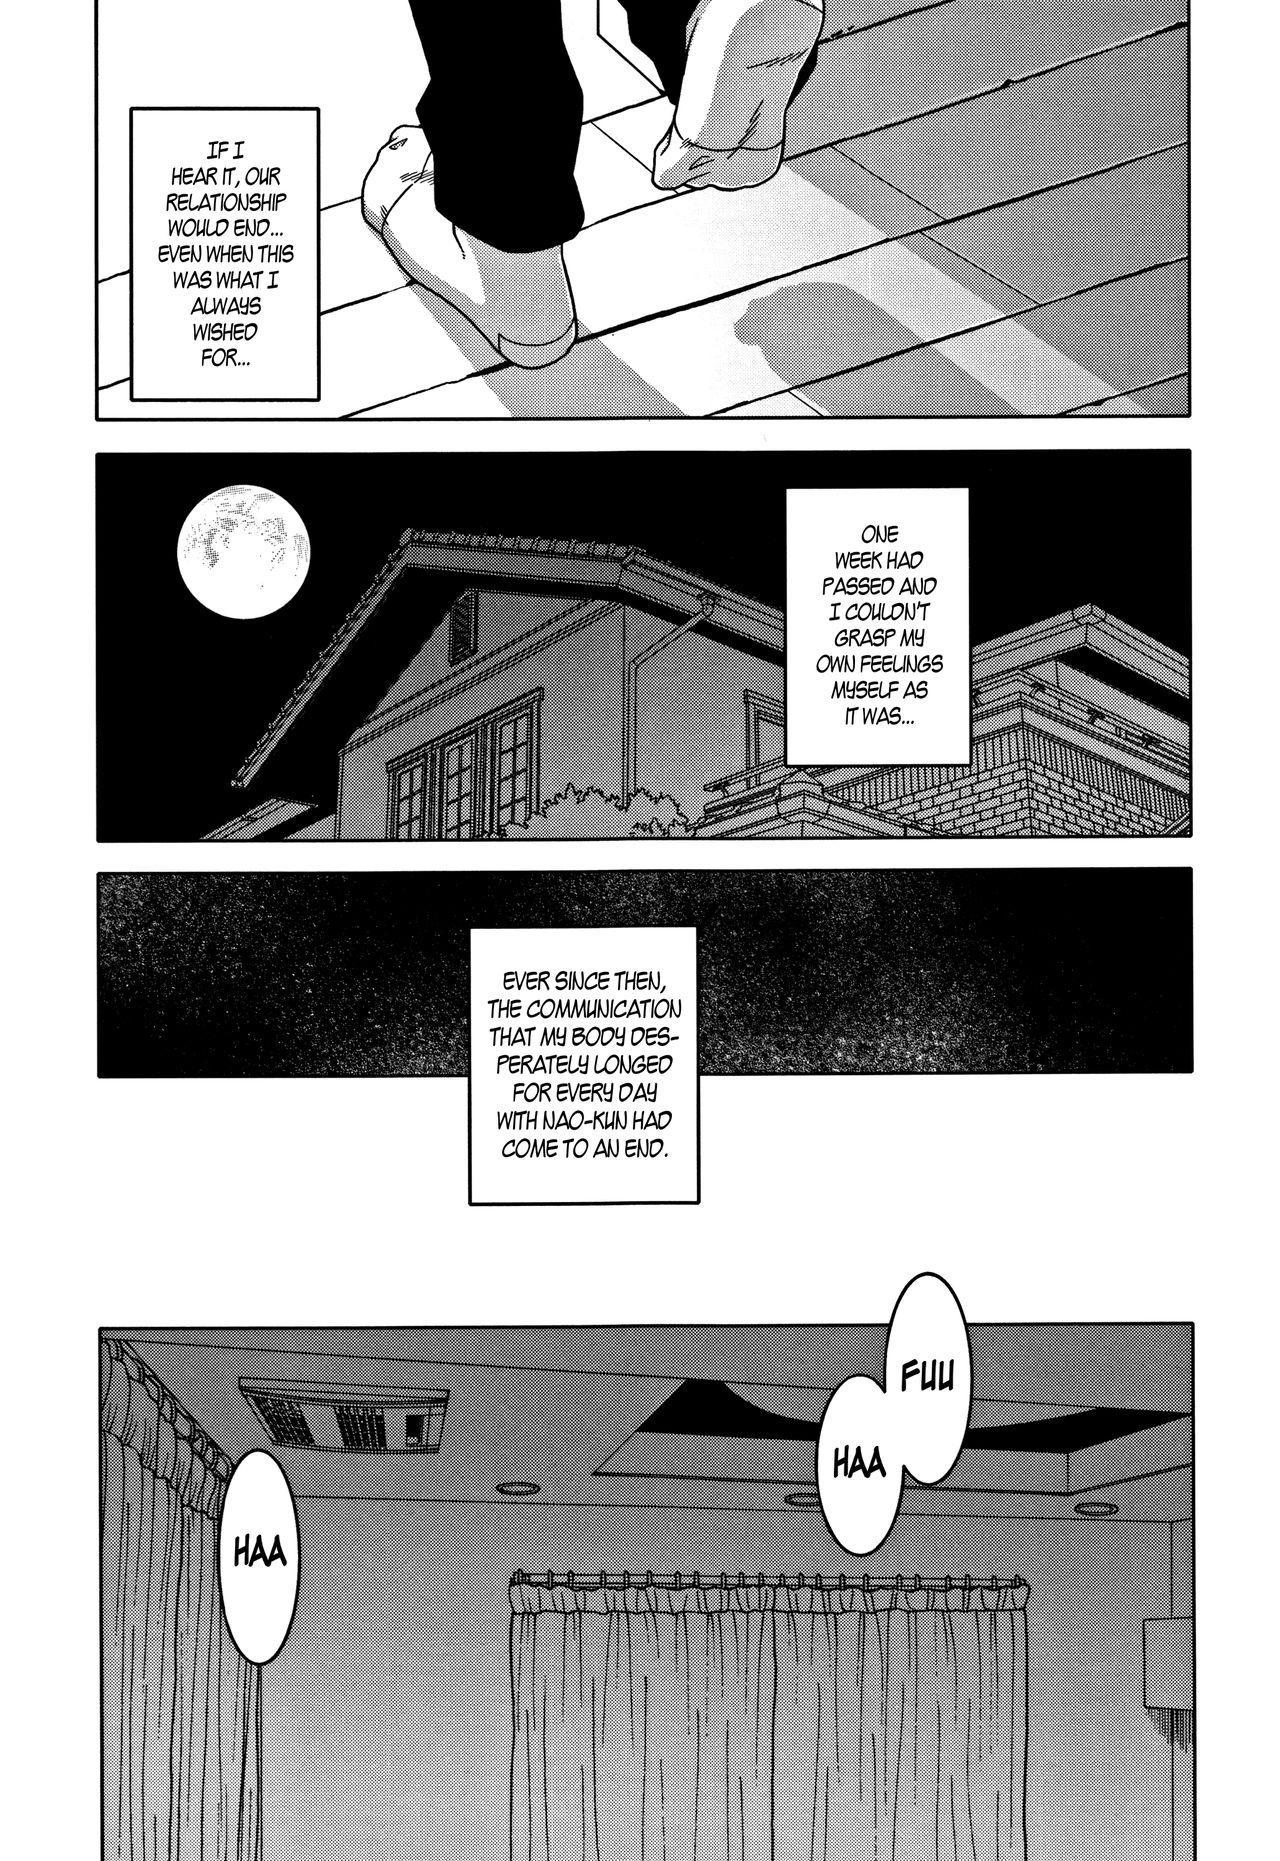 [Takatsu] Hitozuma A-san to Musuko no Yuujin N-kun - Married wife A and son's friend N-kun [English] 78